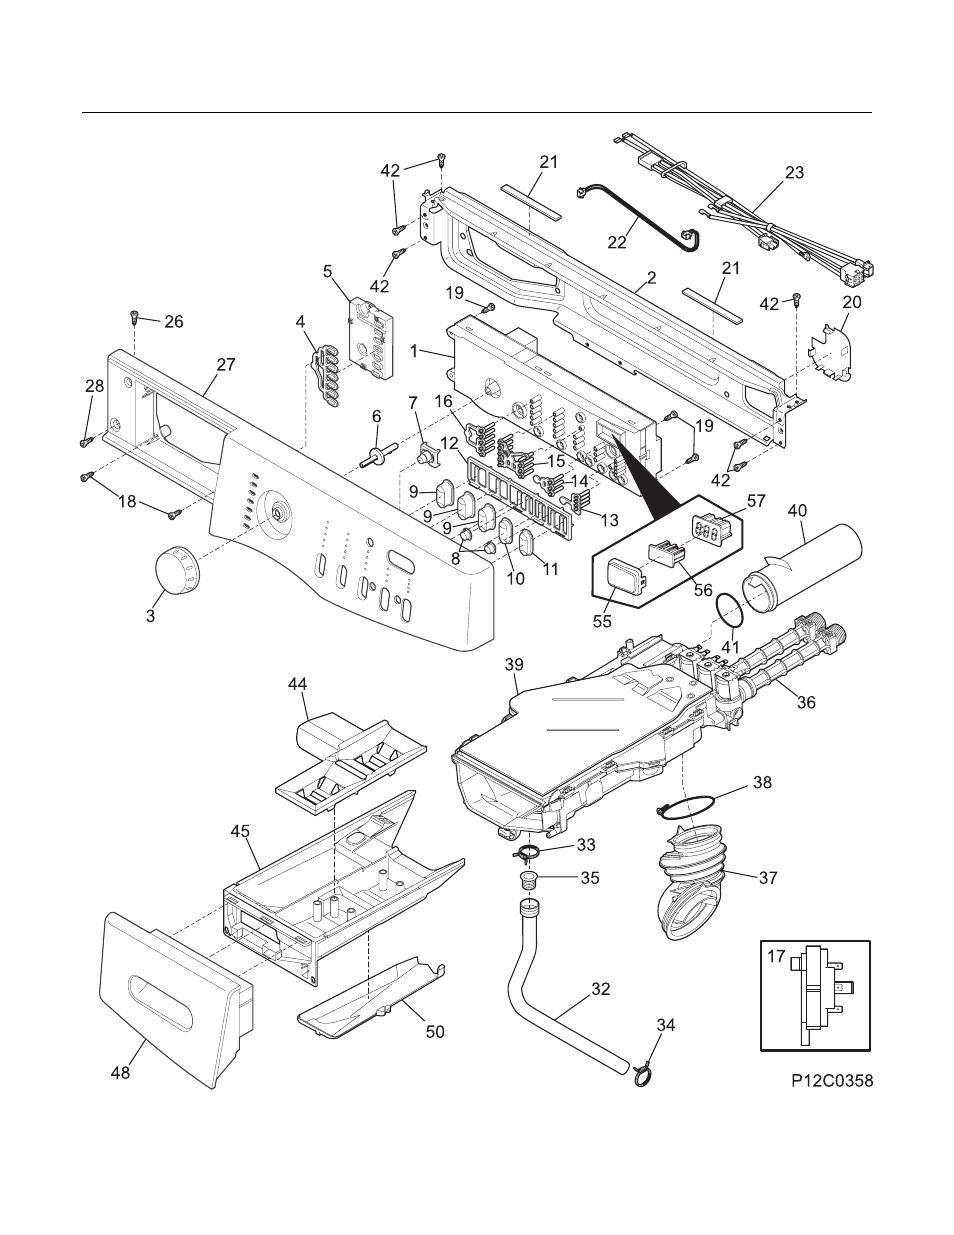 frigidaire ltf6000es0 user manual